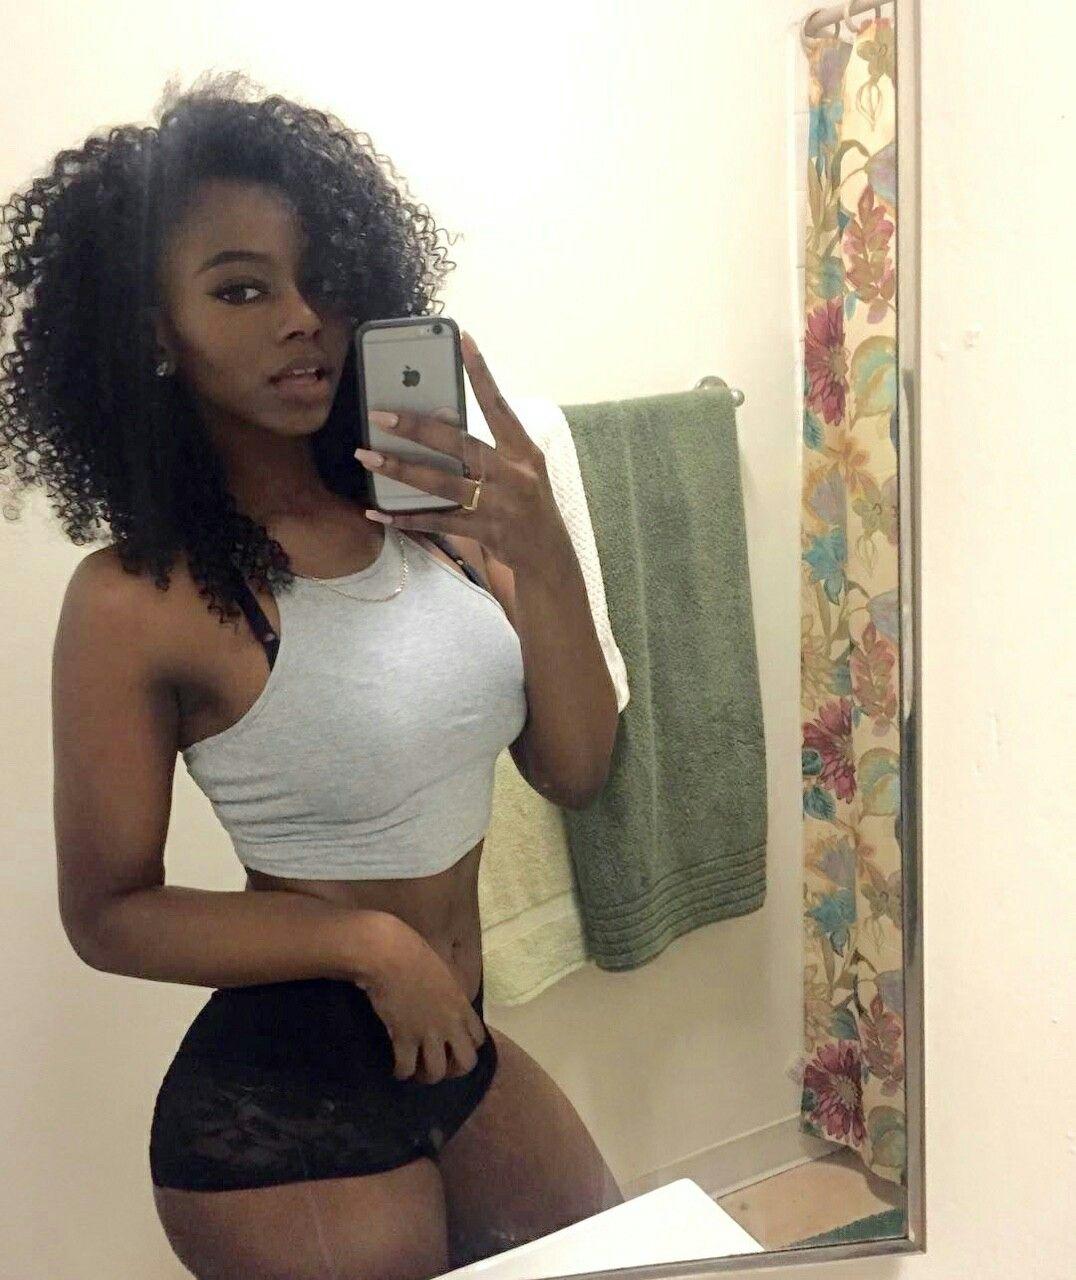 Perky black girls